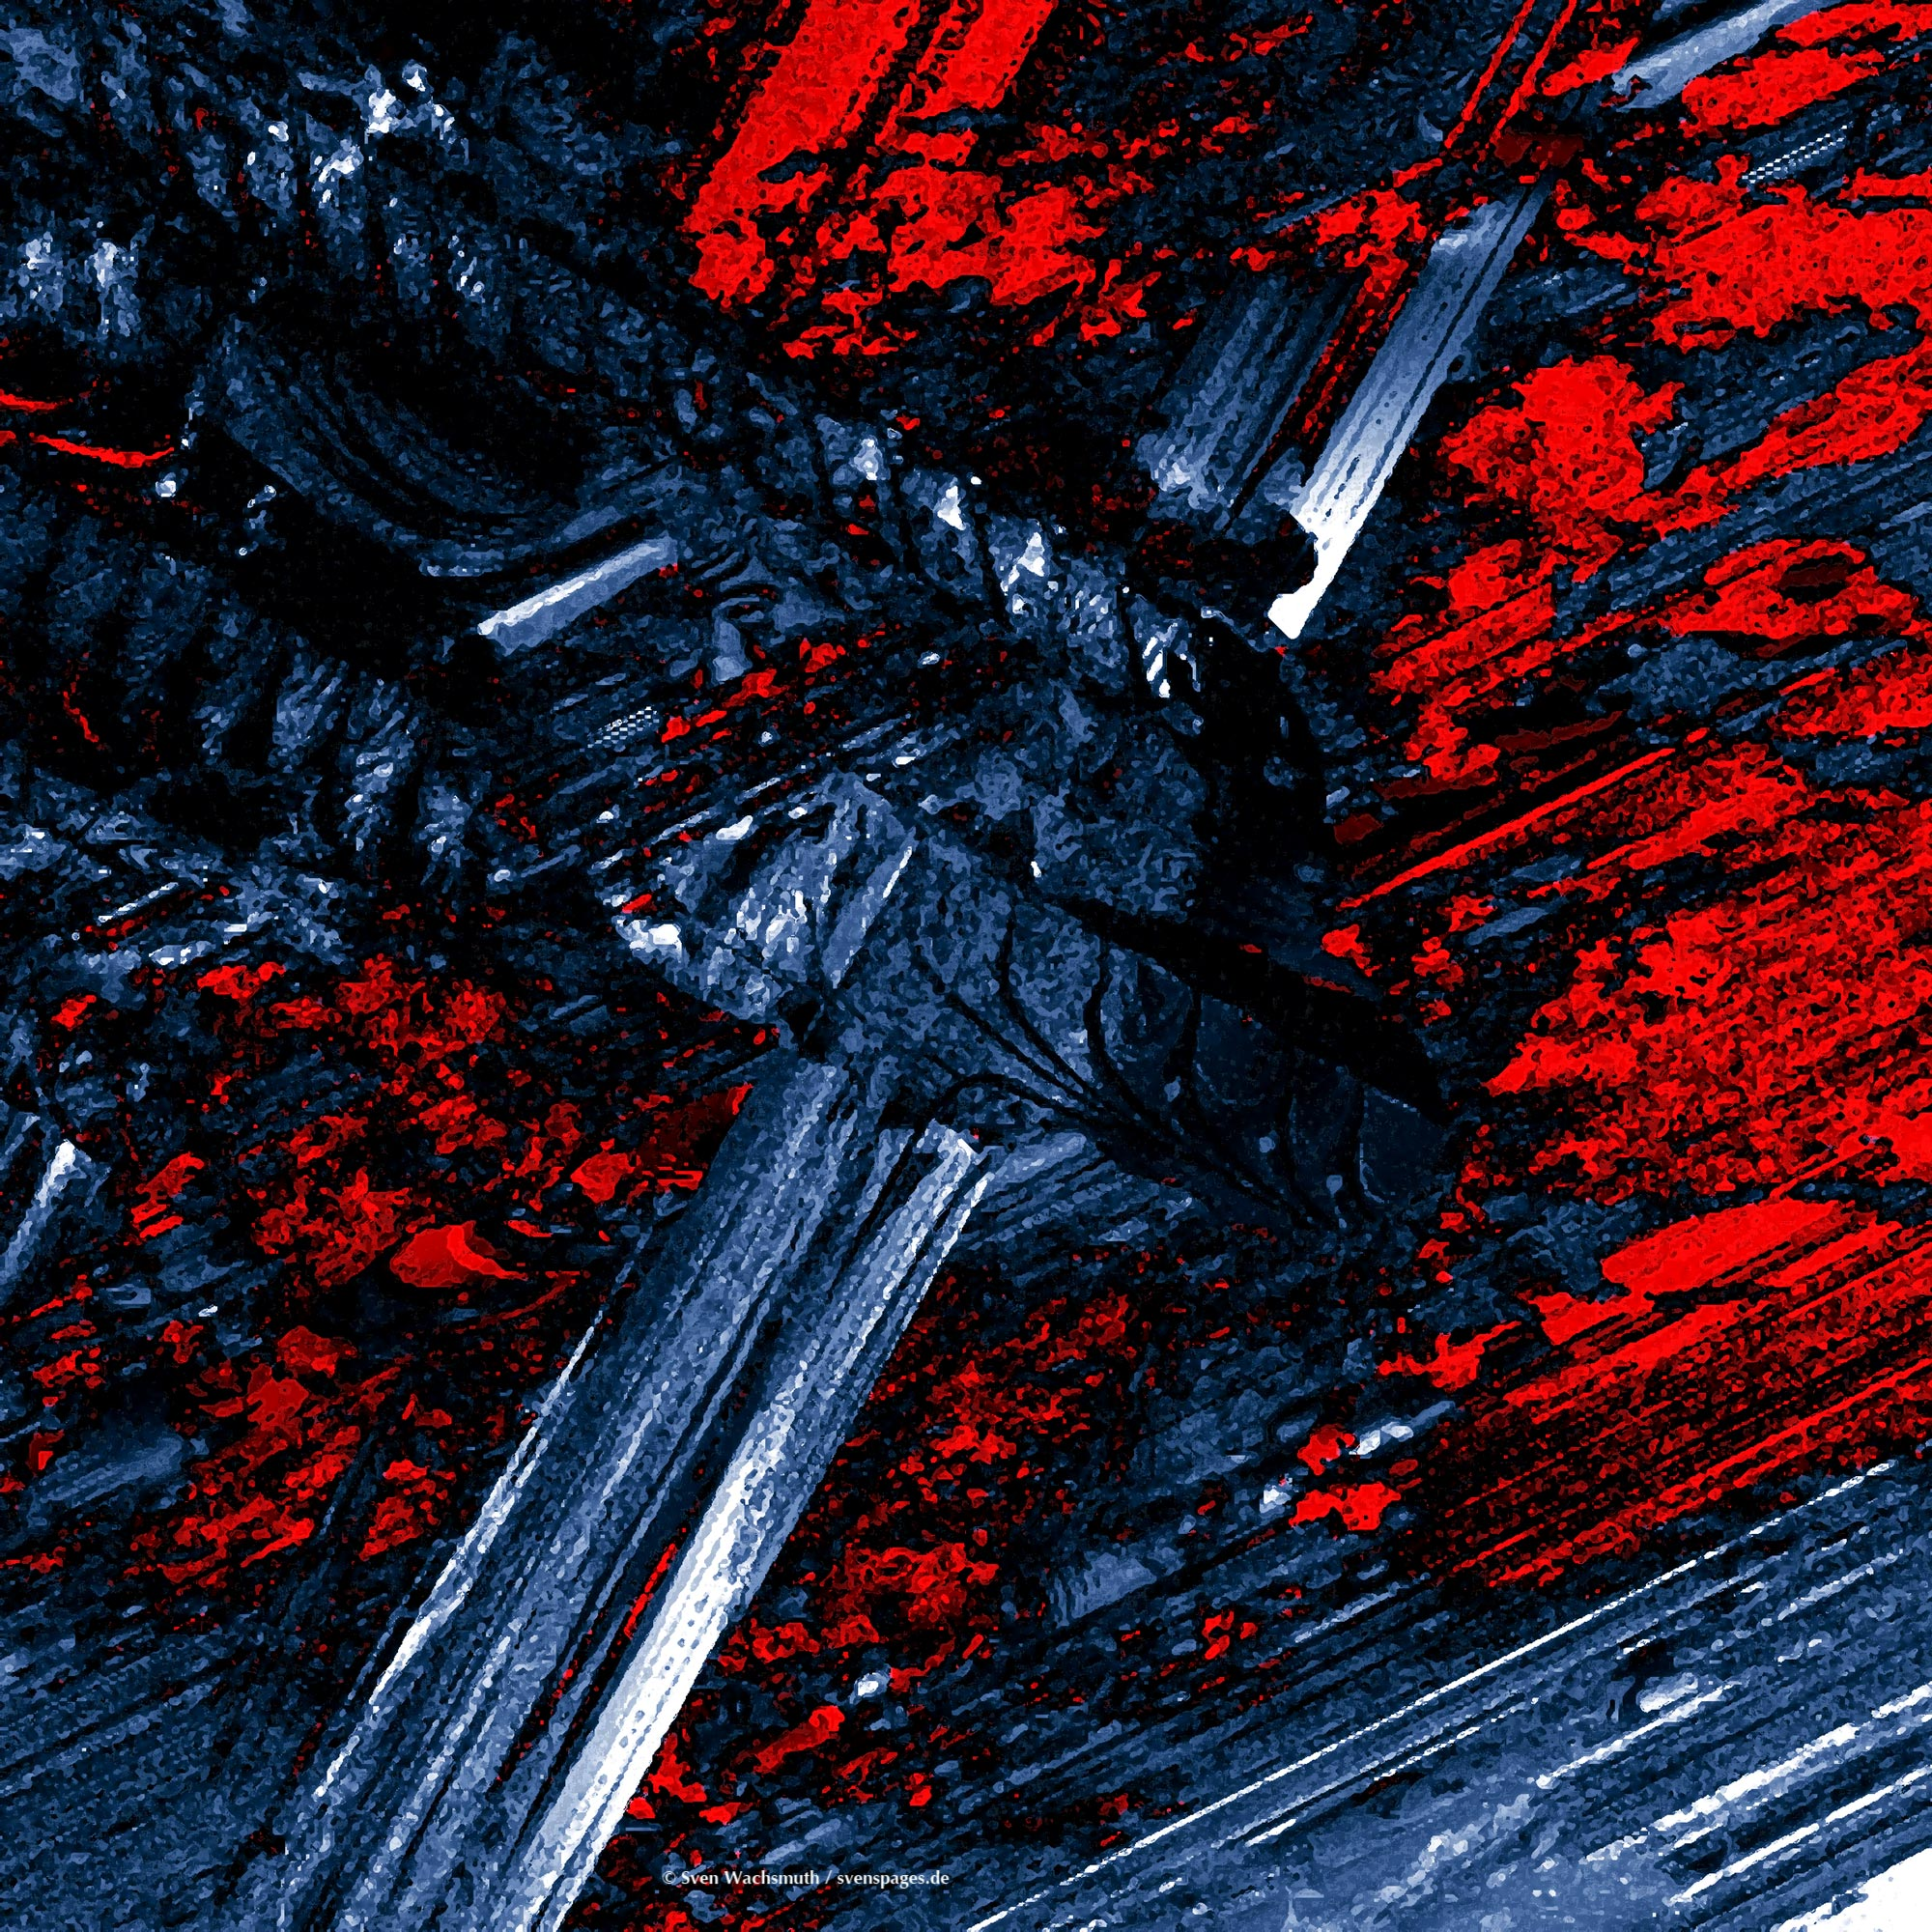 2003-02-18-alien-space-crystals